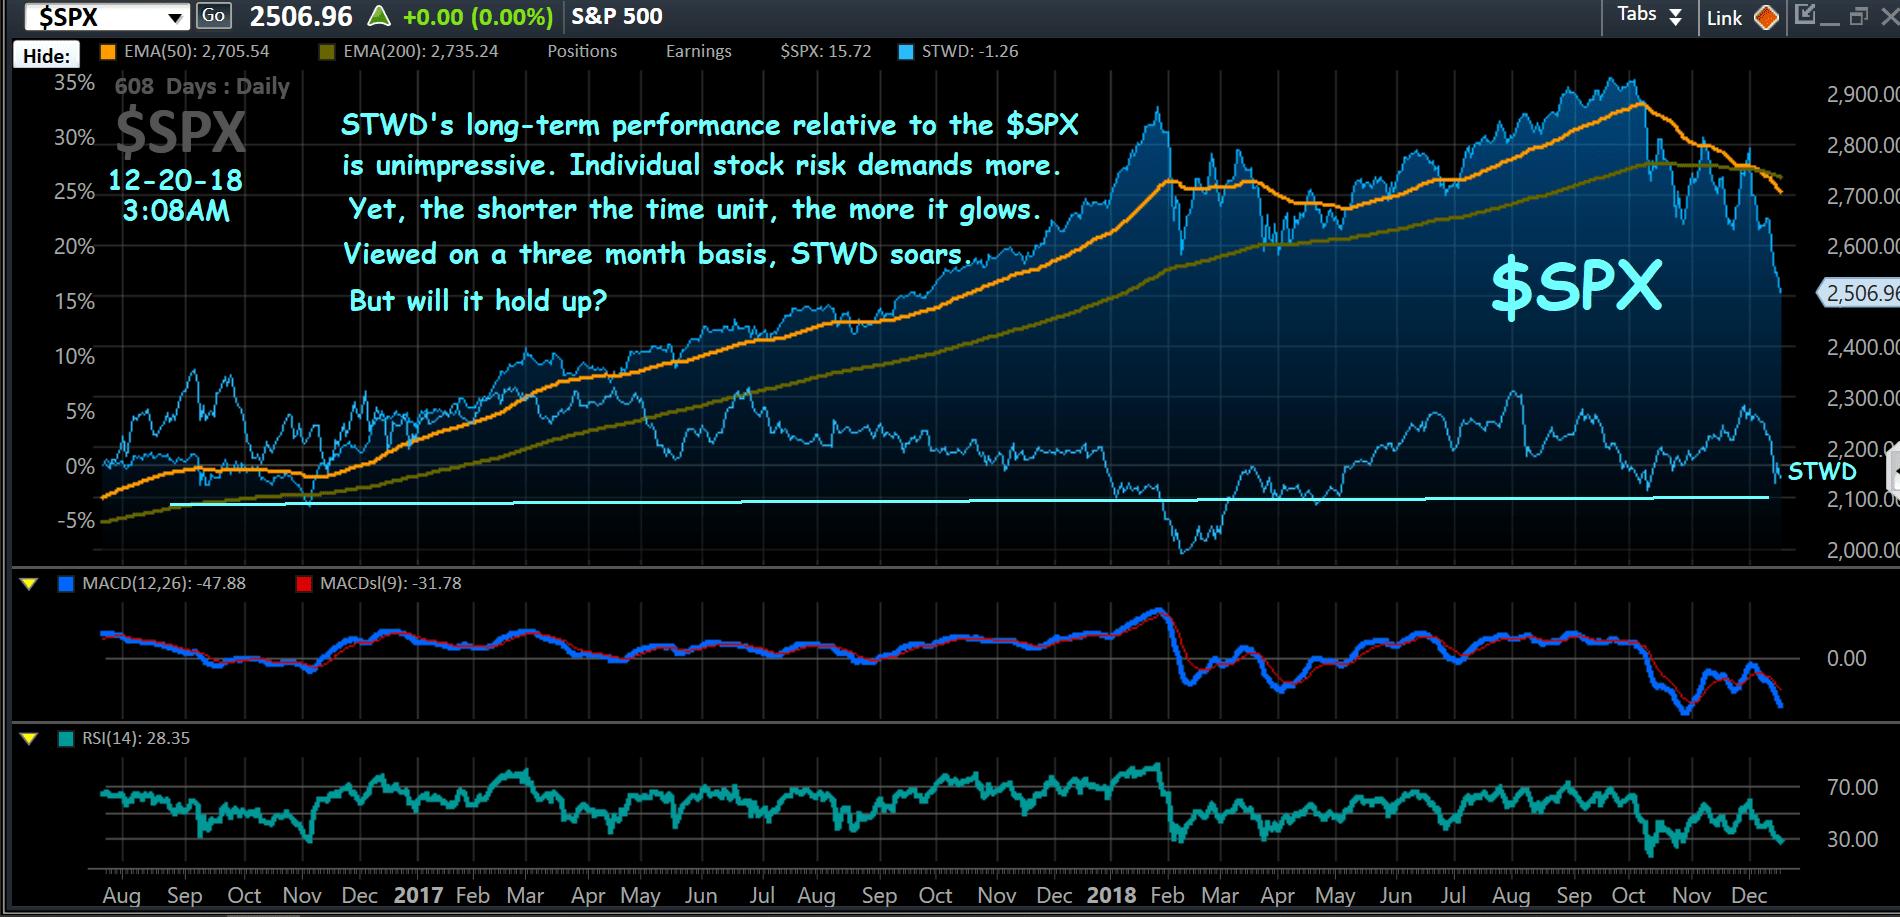 Chart, $SPX, STWD OL, 12-20-18